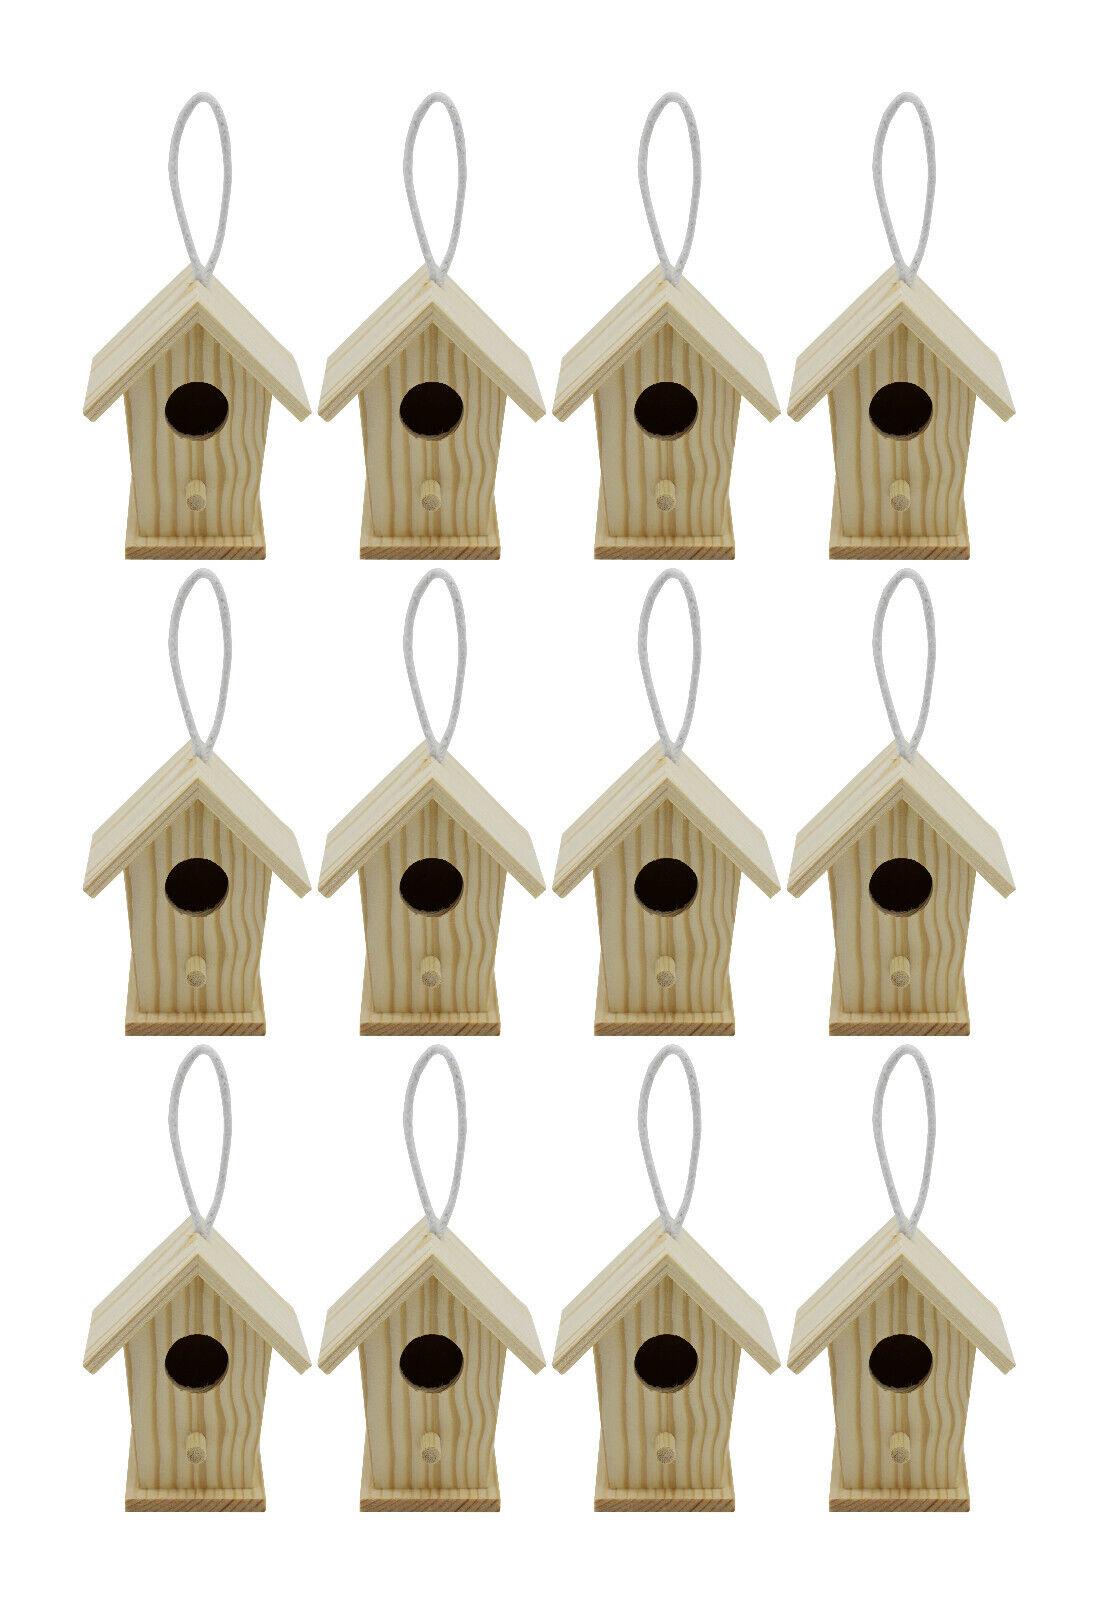 Creative Hobbies 12 Pack of Mini Wooden Bird Houses To Paint, Design Your Own Bird & Wildlife Accessories